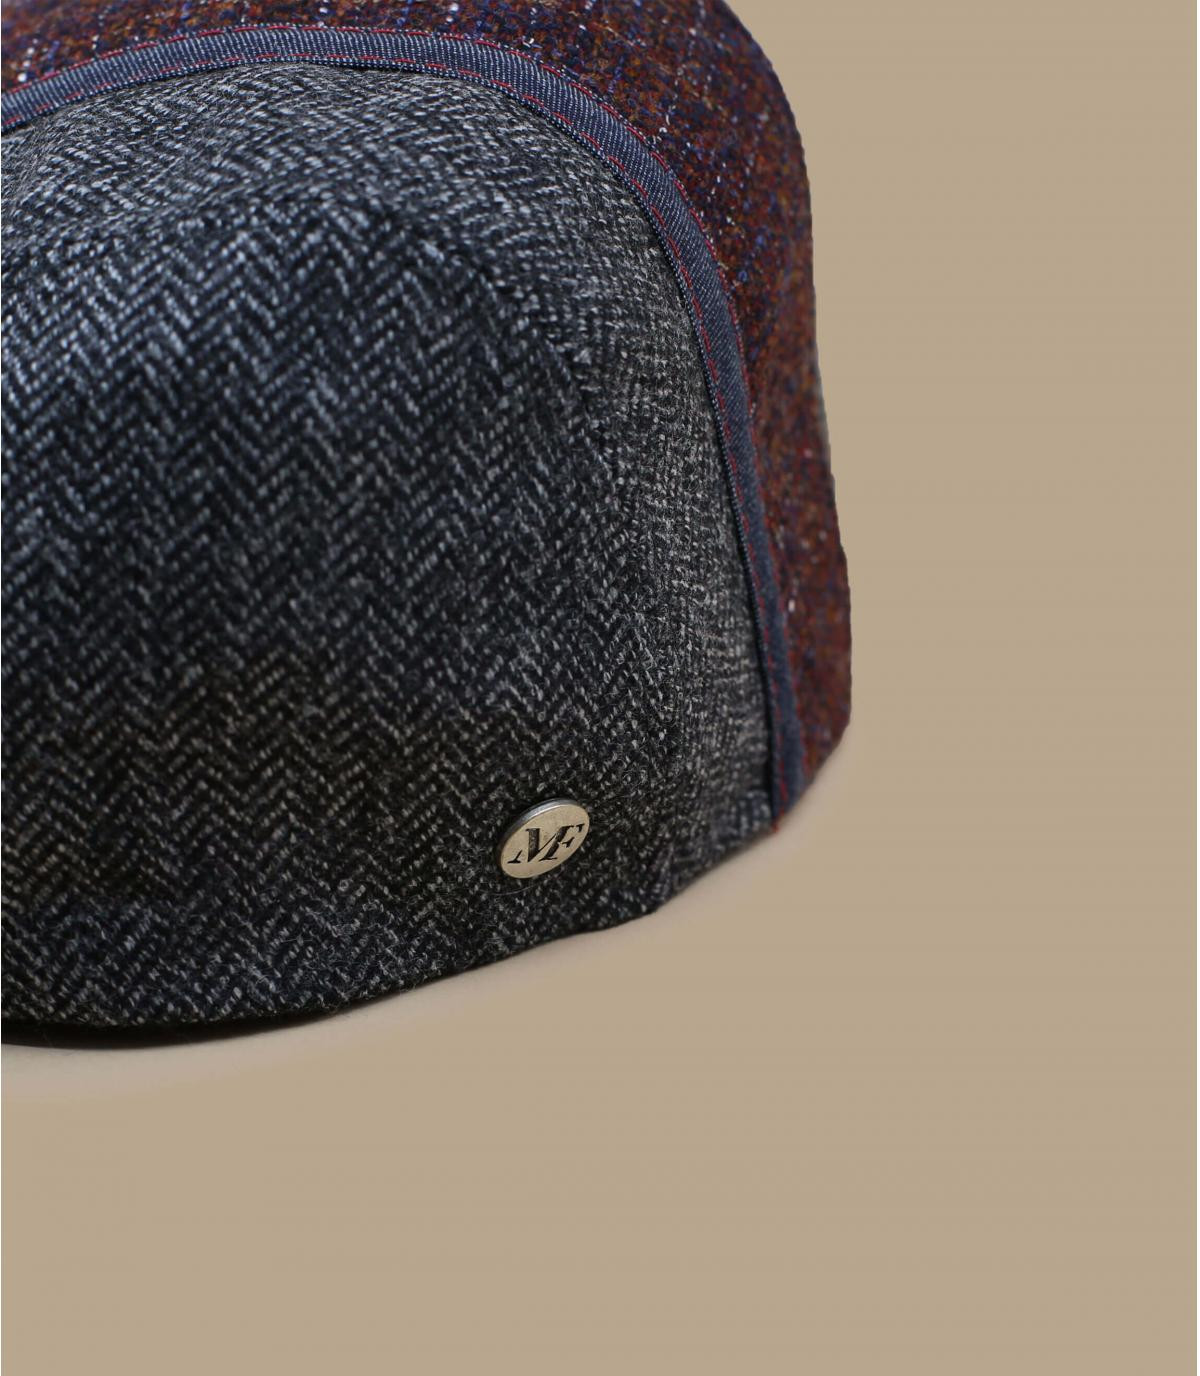 Flatcap zweifarbig grau bordeaux